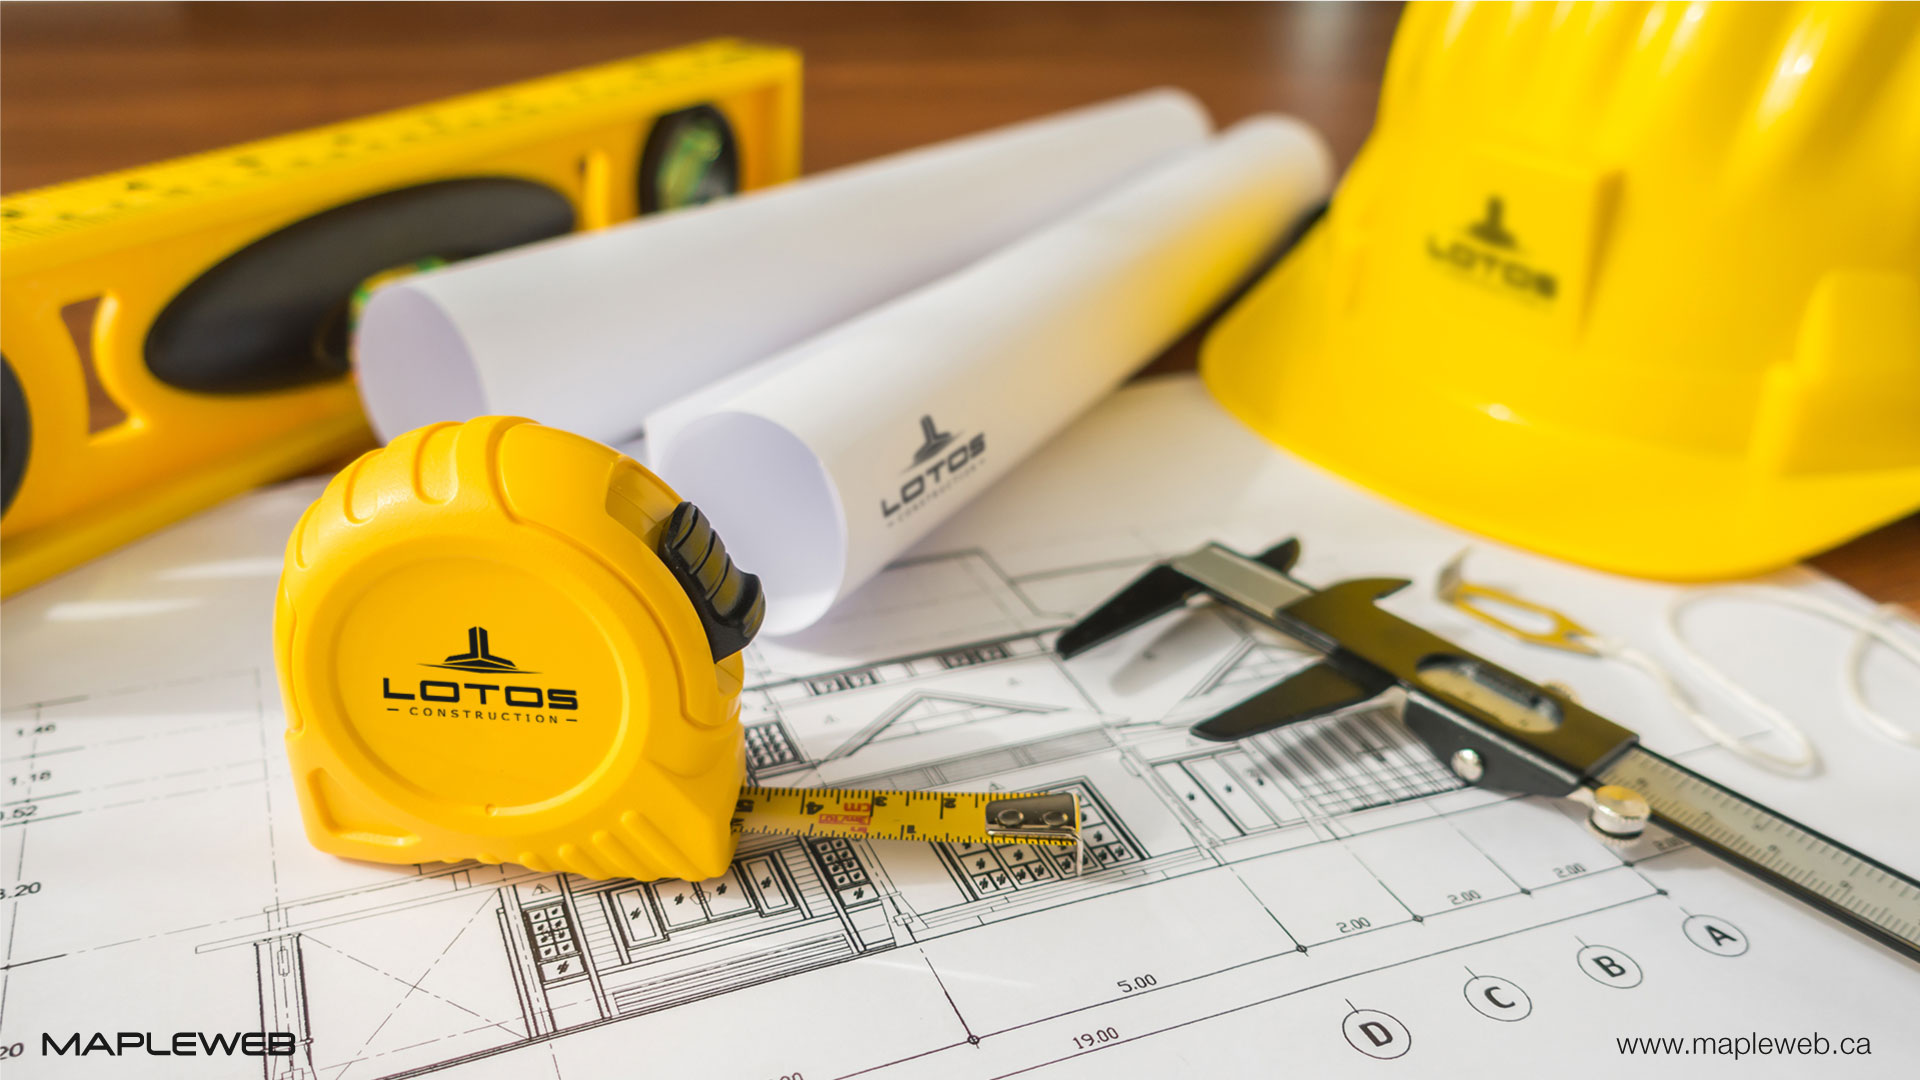 lotos-construction-brand-logo-design-by-mapleweb-vancouver-canada-constrcution-safety-helmet-and-uniform-mock